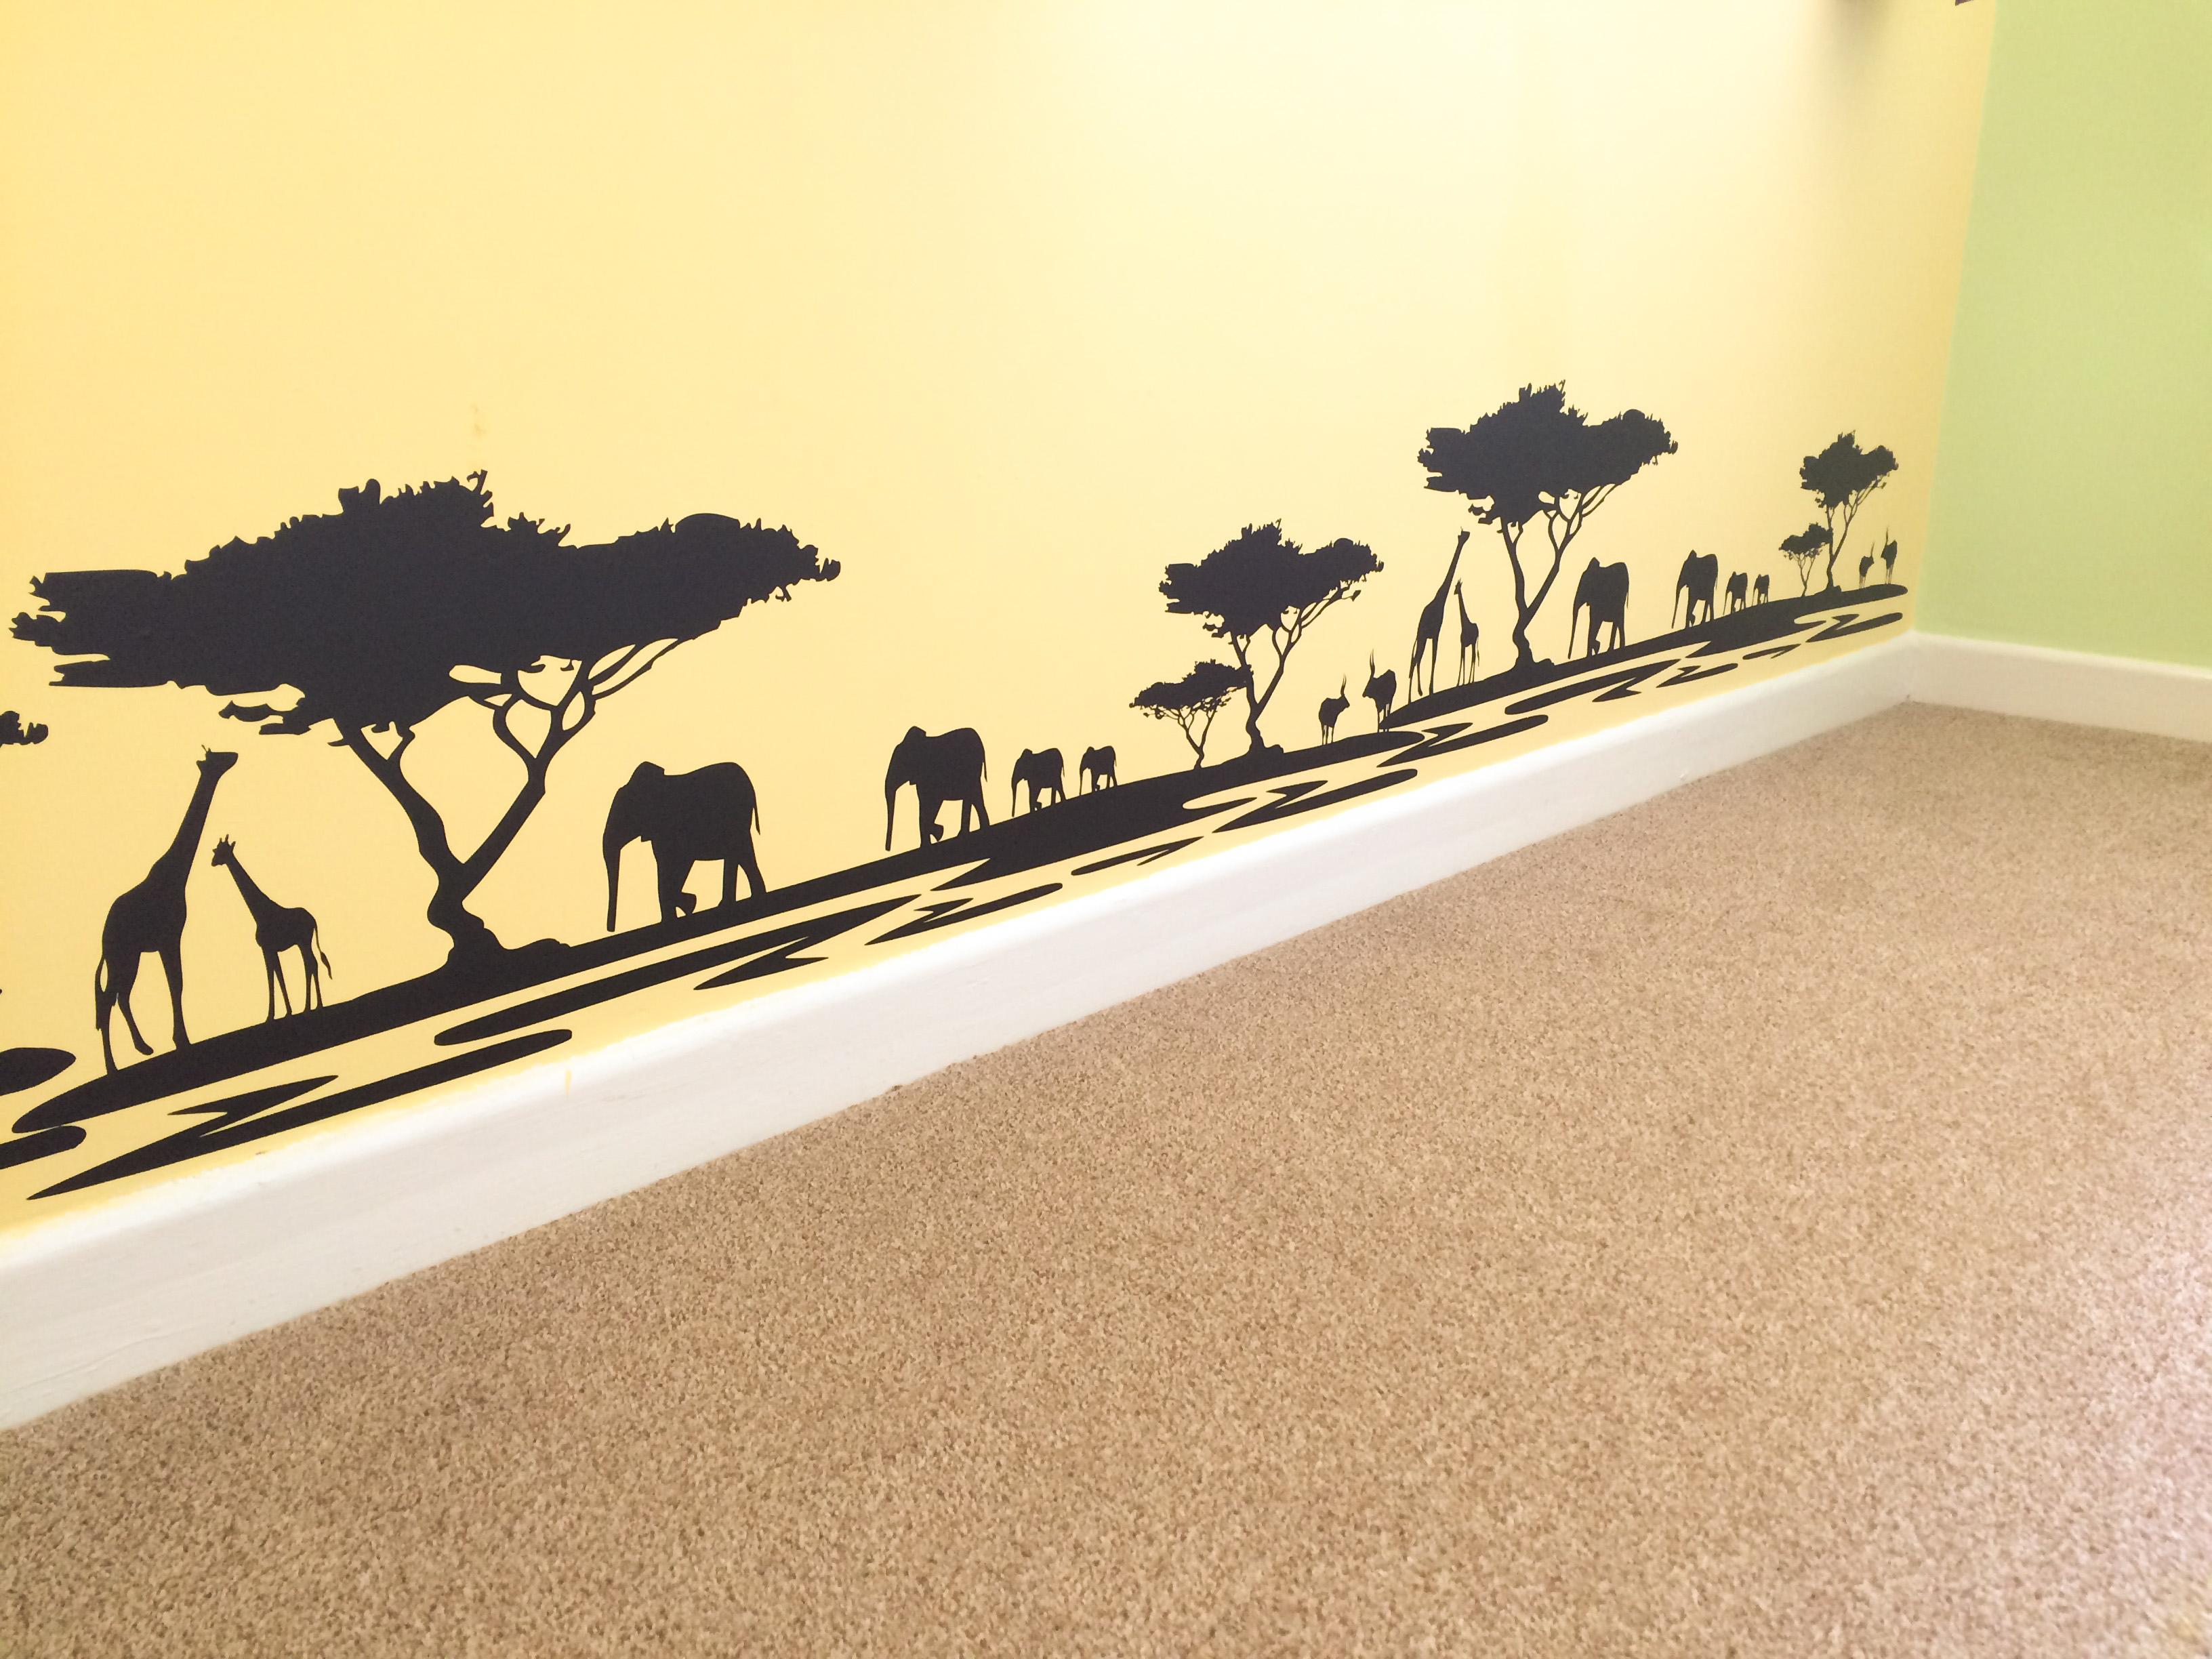 Safari / Lion King Themed Nursery